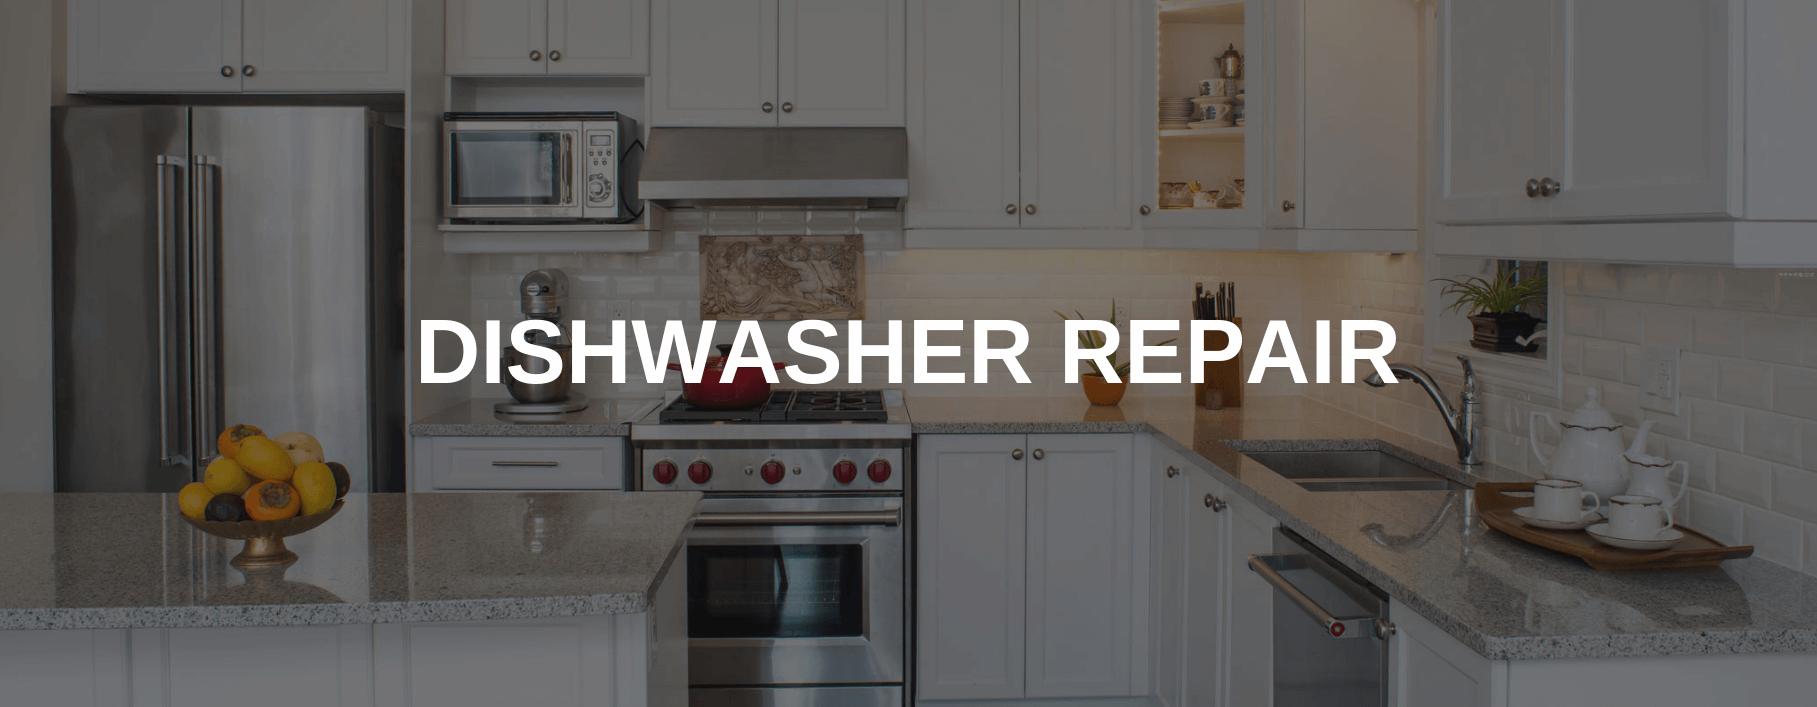 dishwasher repair hartford